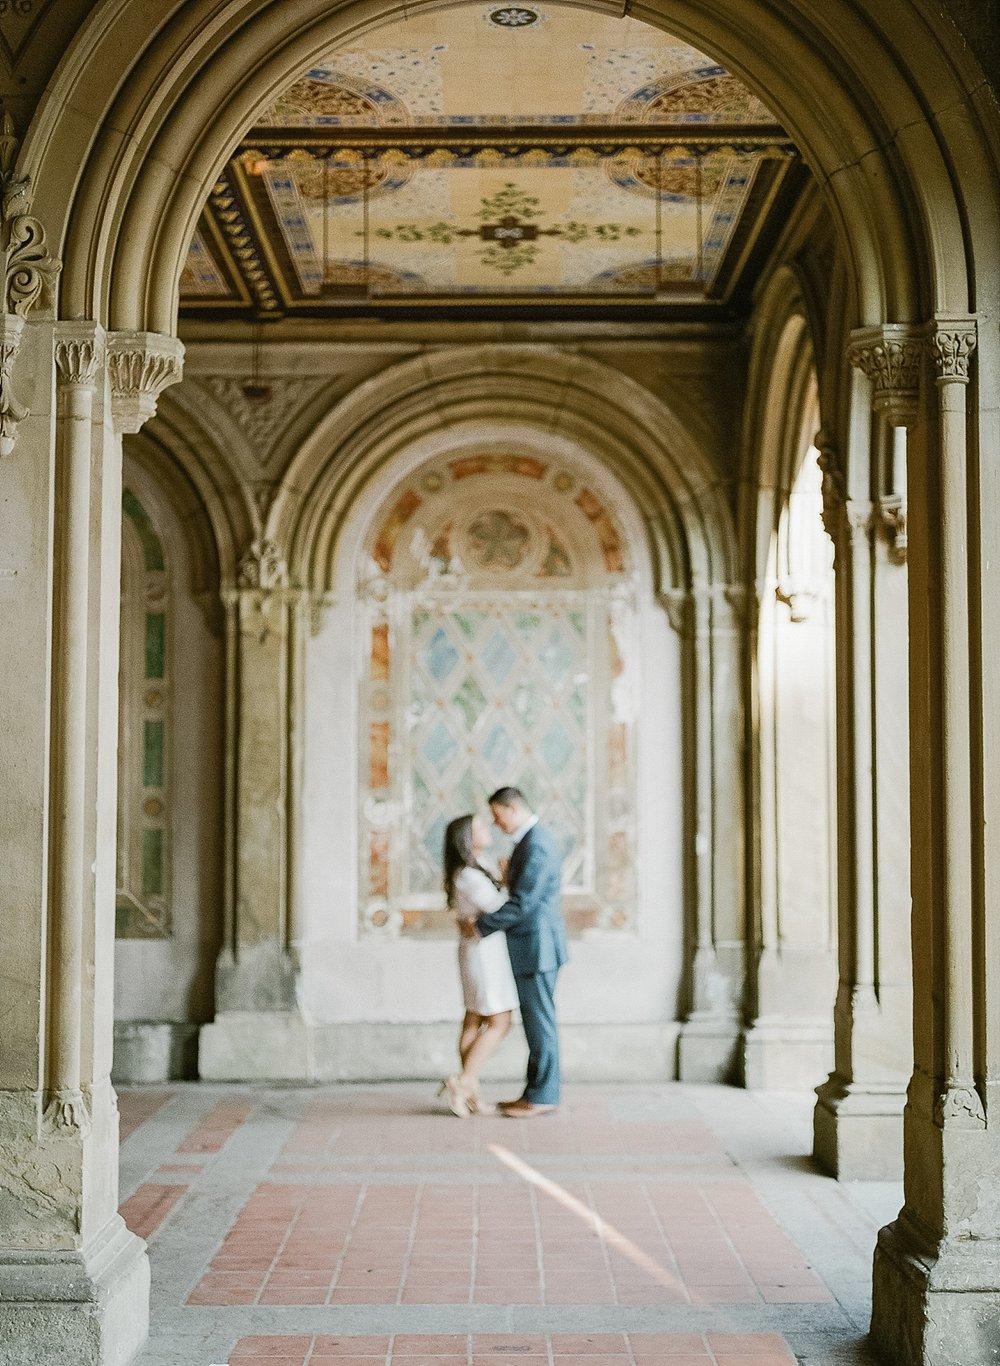 Featured - Mike & Emma's Central Park, Seaport District & East Village engagement